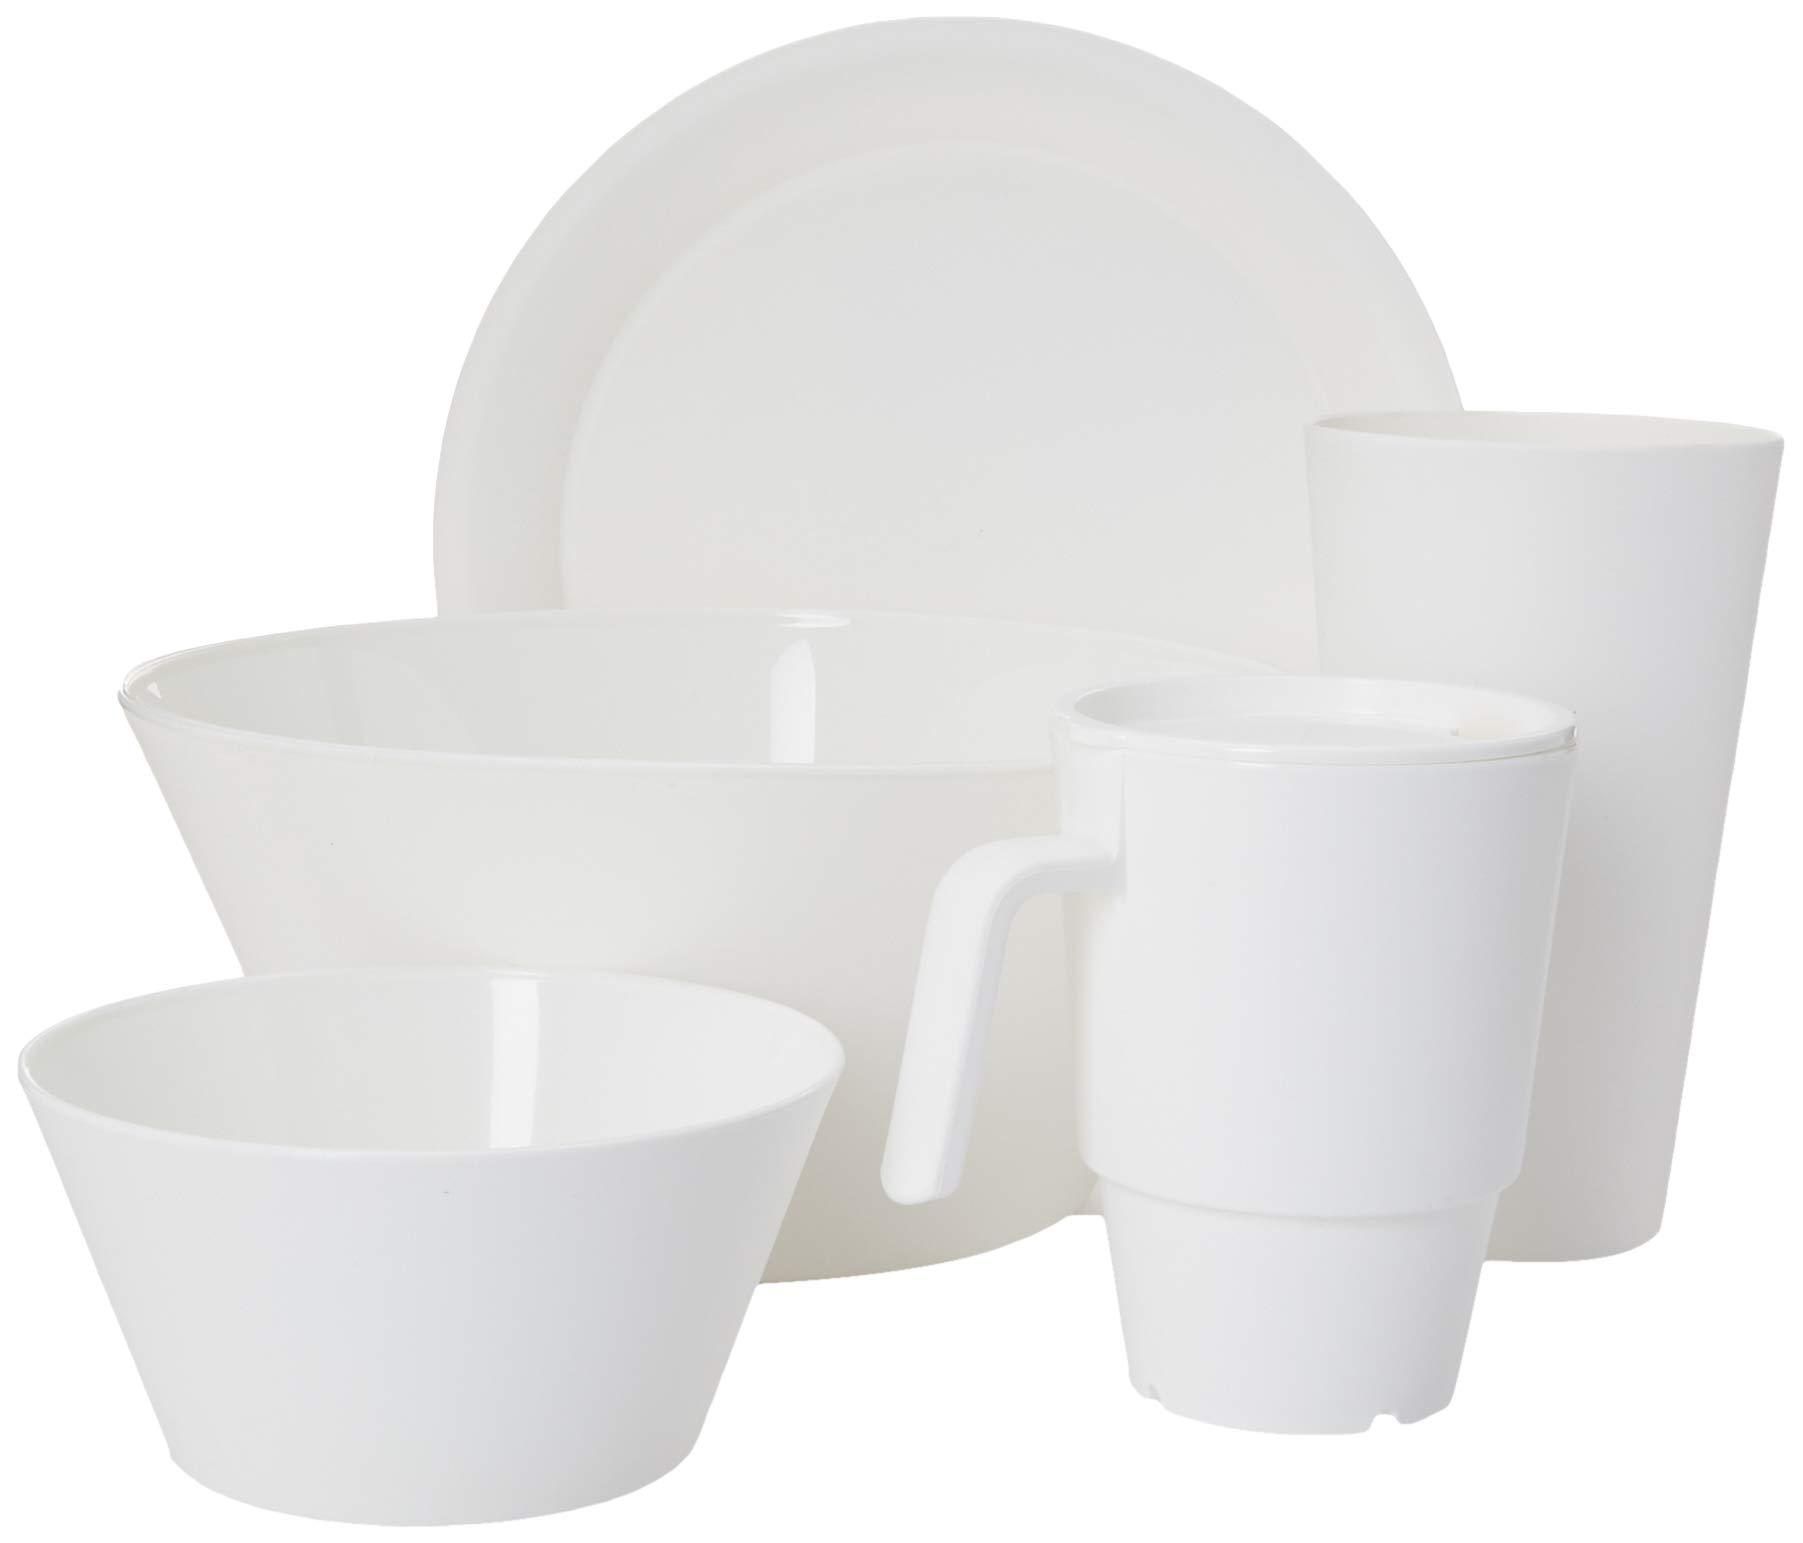 CreativeWare CH621 CH621WH 21 Piece My First Dorm/Apartment Plastic Dish Set, White